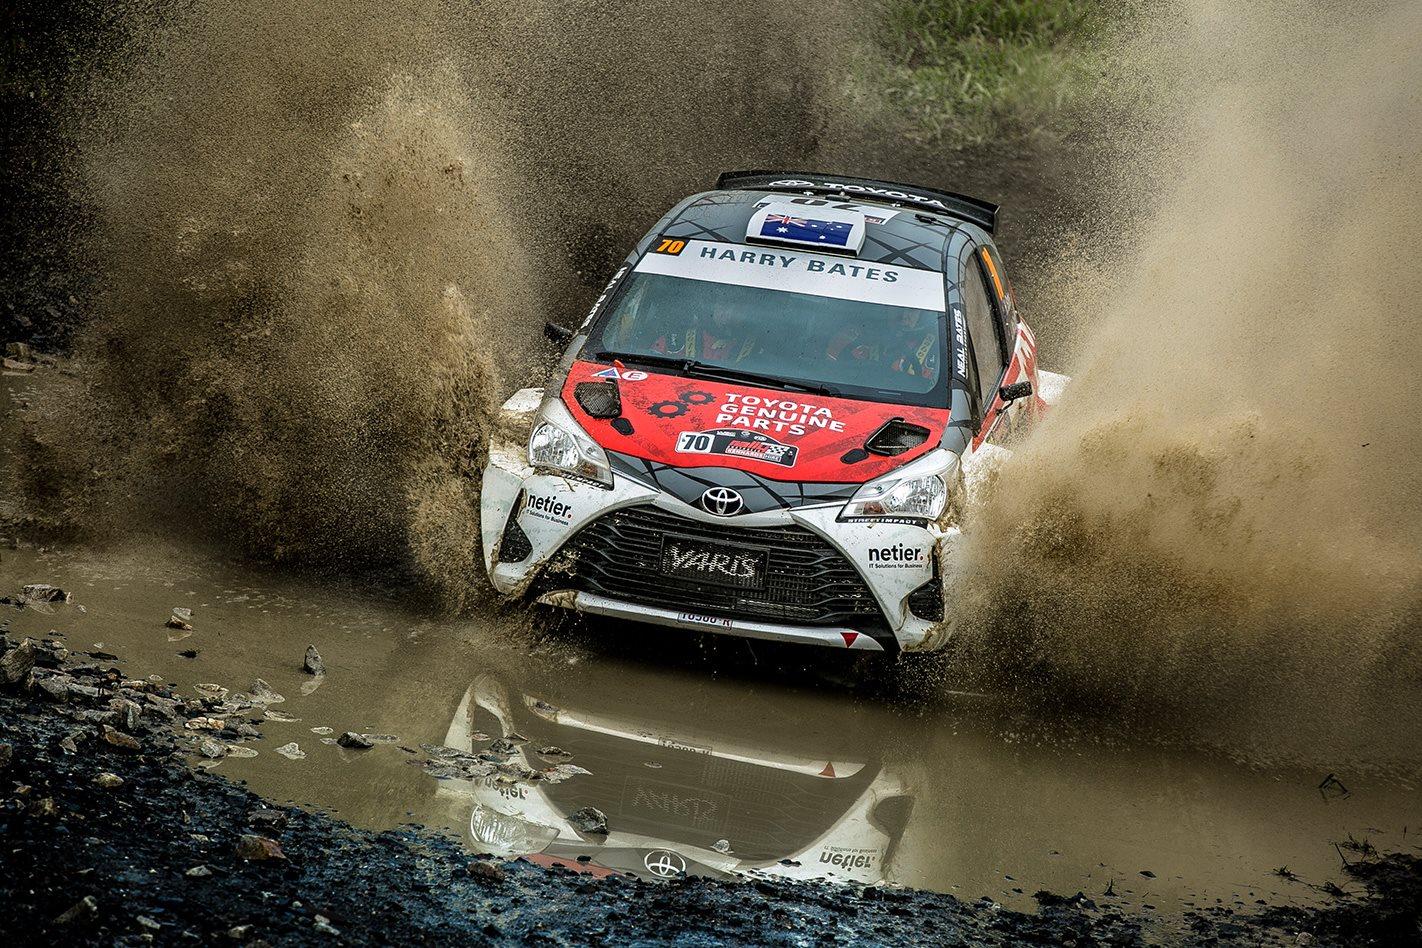 2017 Toyota Yaris AP4 watercrossing